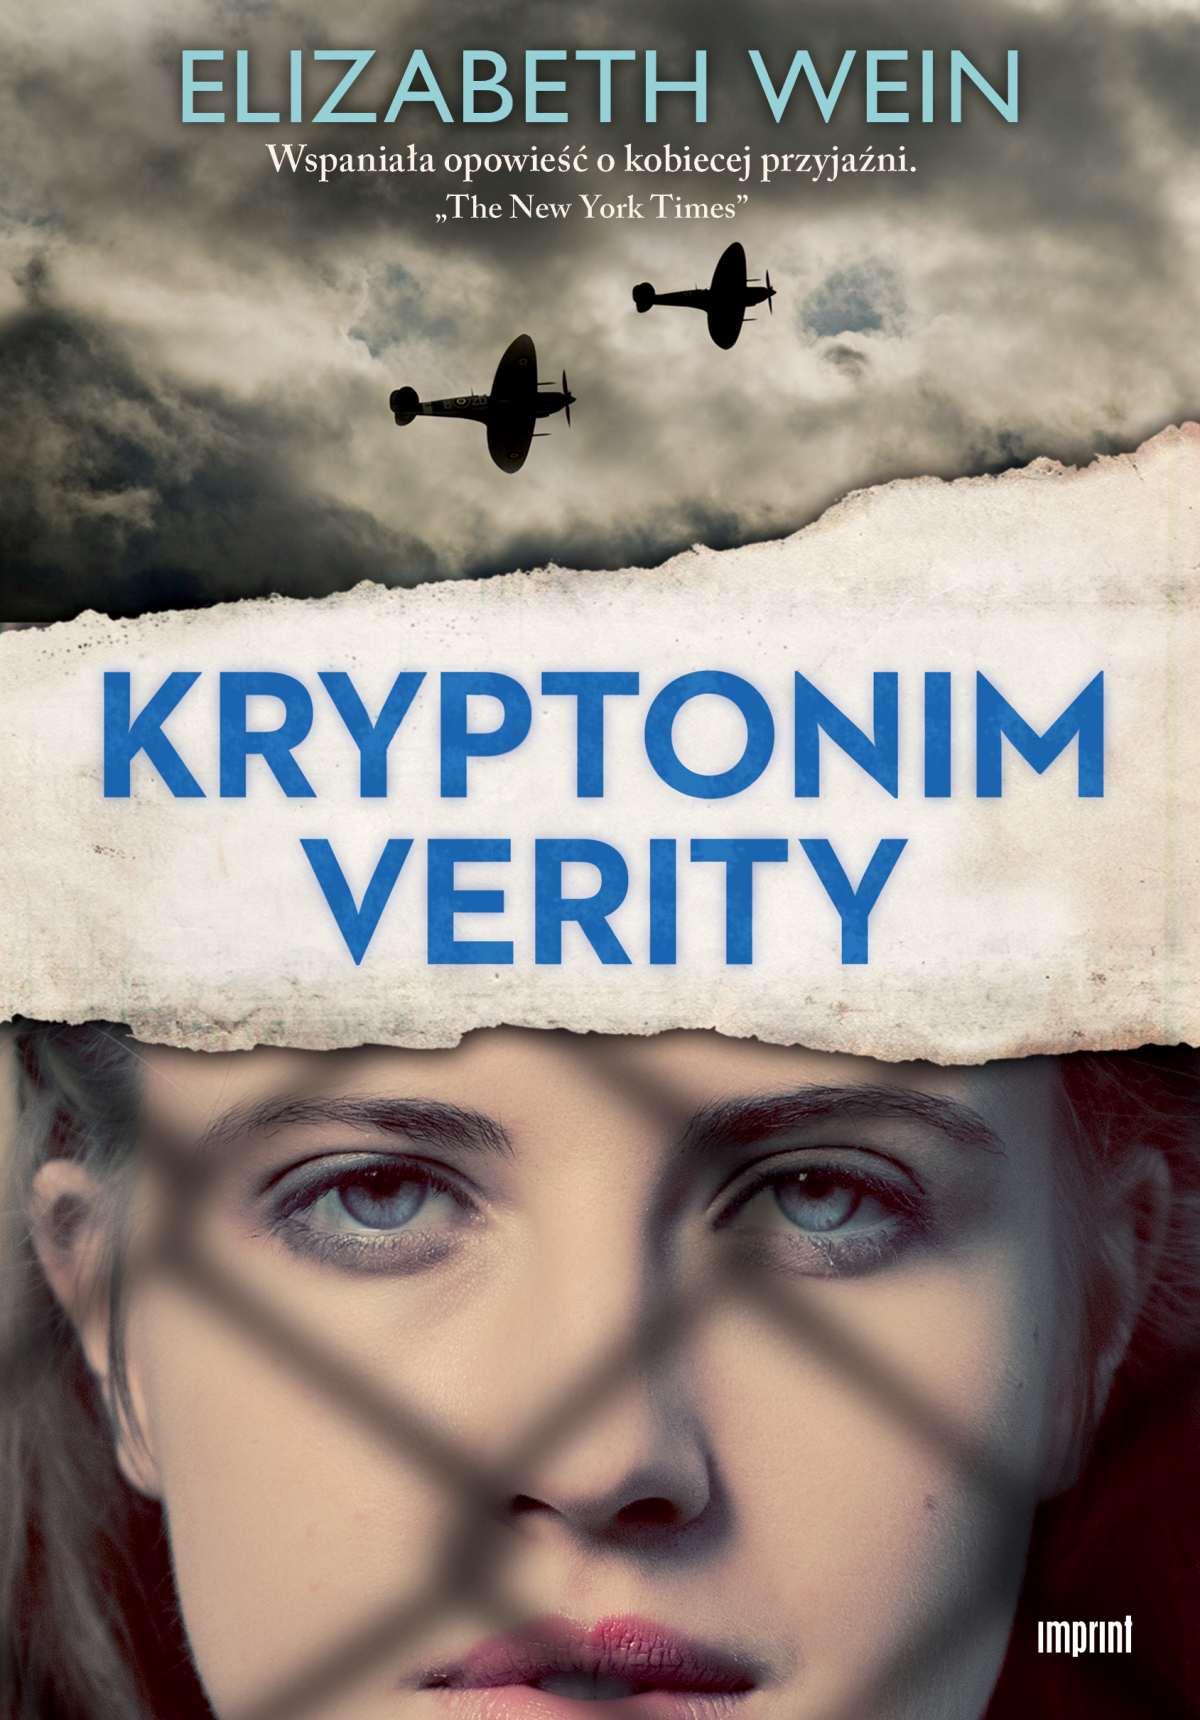 Kryptonim Verity - Ebook (Książka EPUB) do pobrania w formacie EPUB